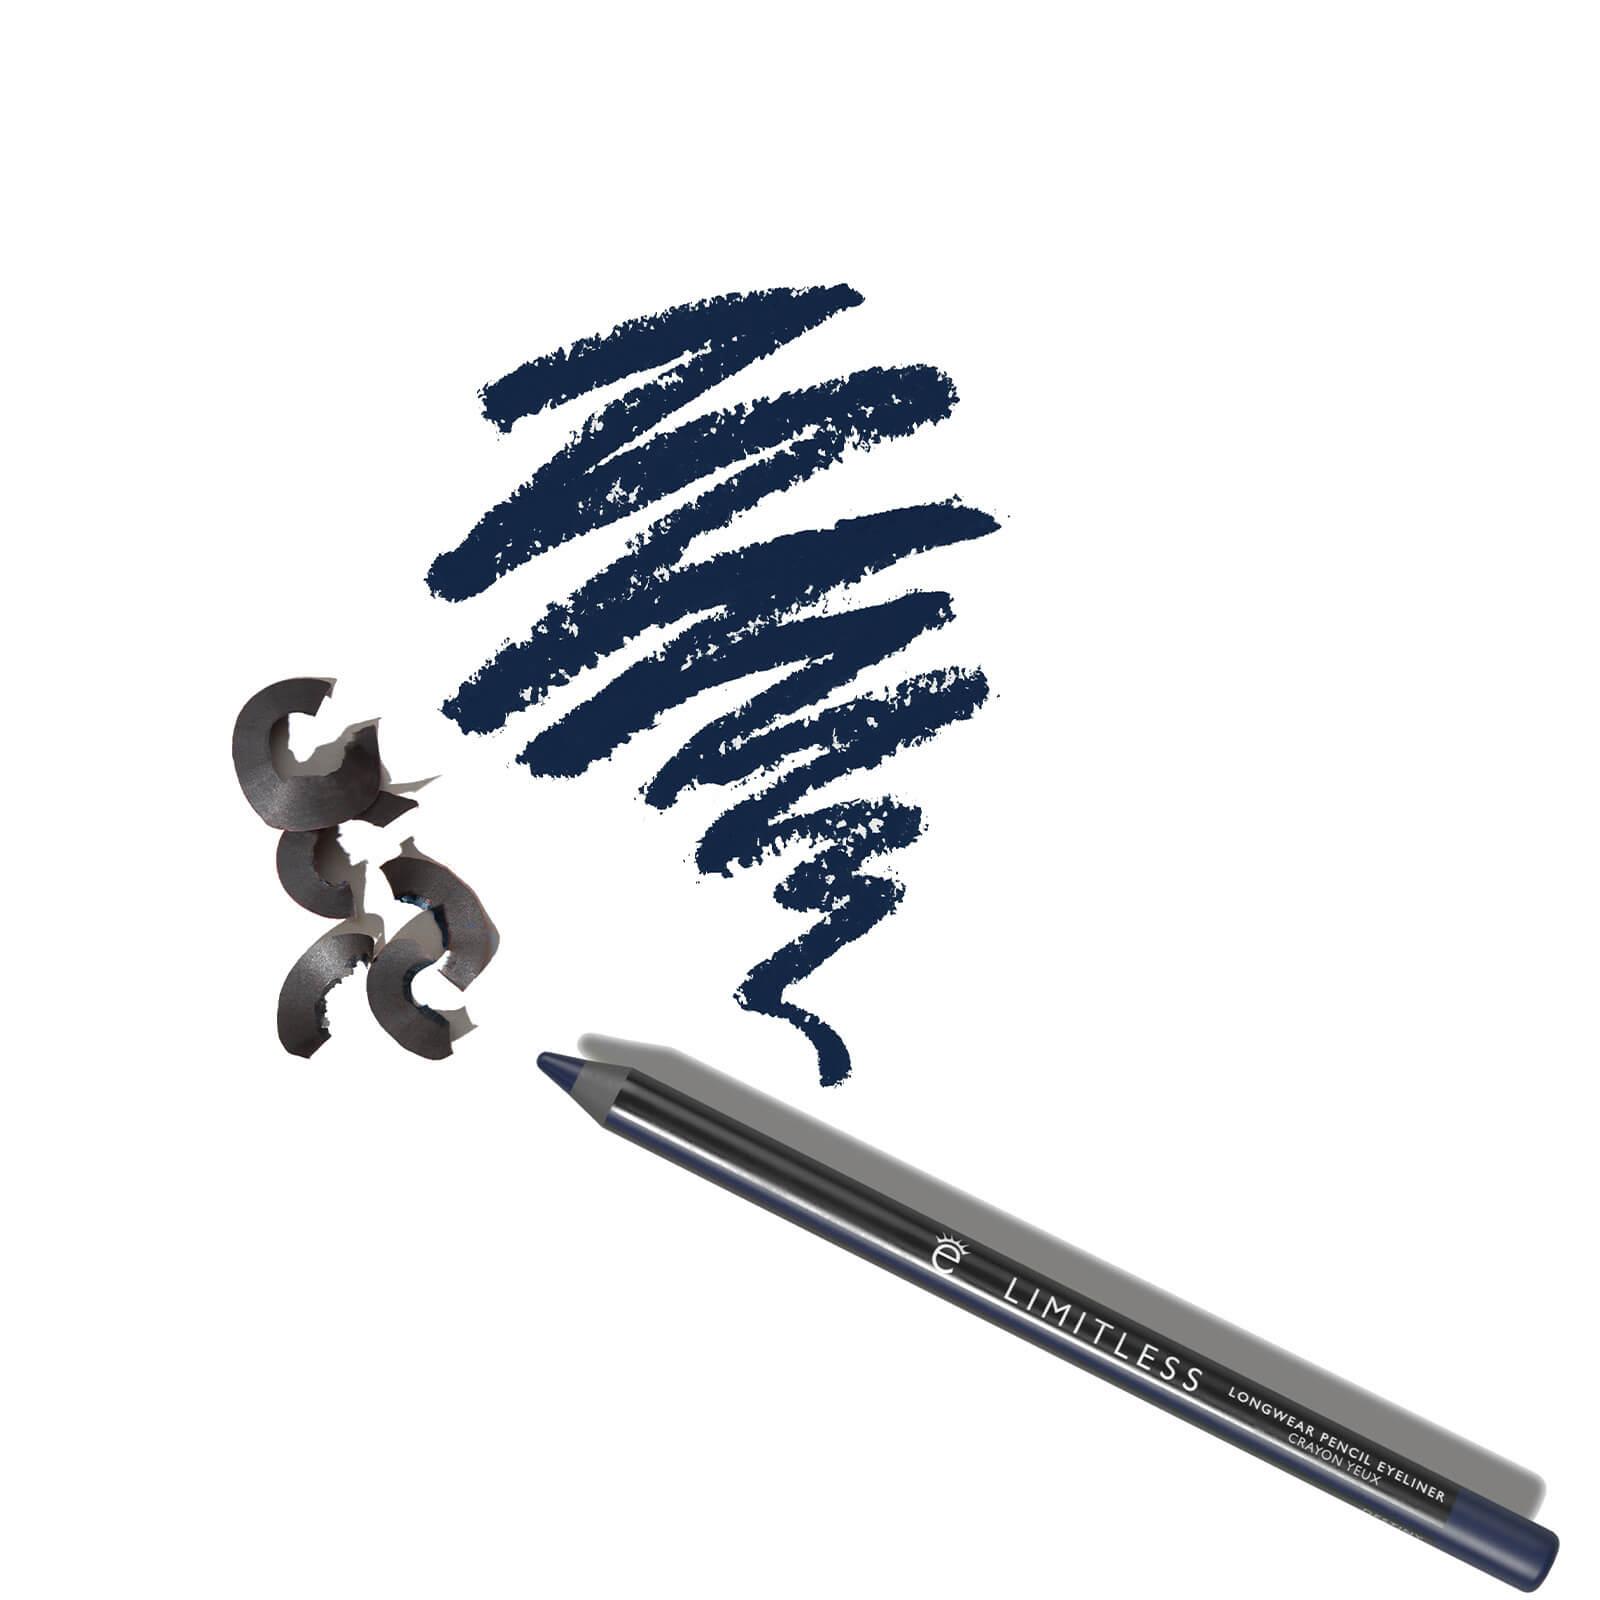 Cosmetics Limitless Long-Wear Pencil Eyeliner - Destiny